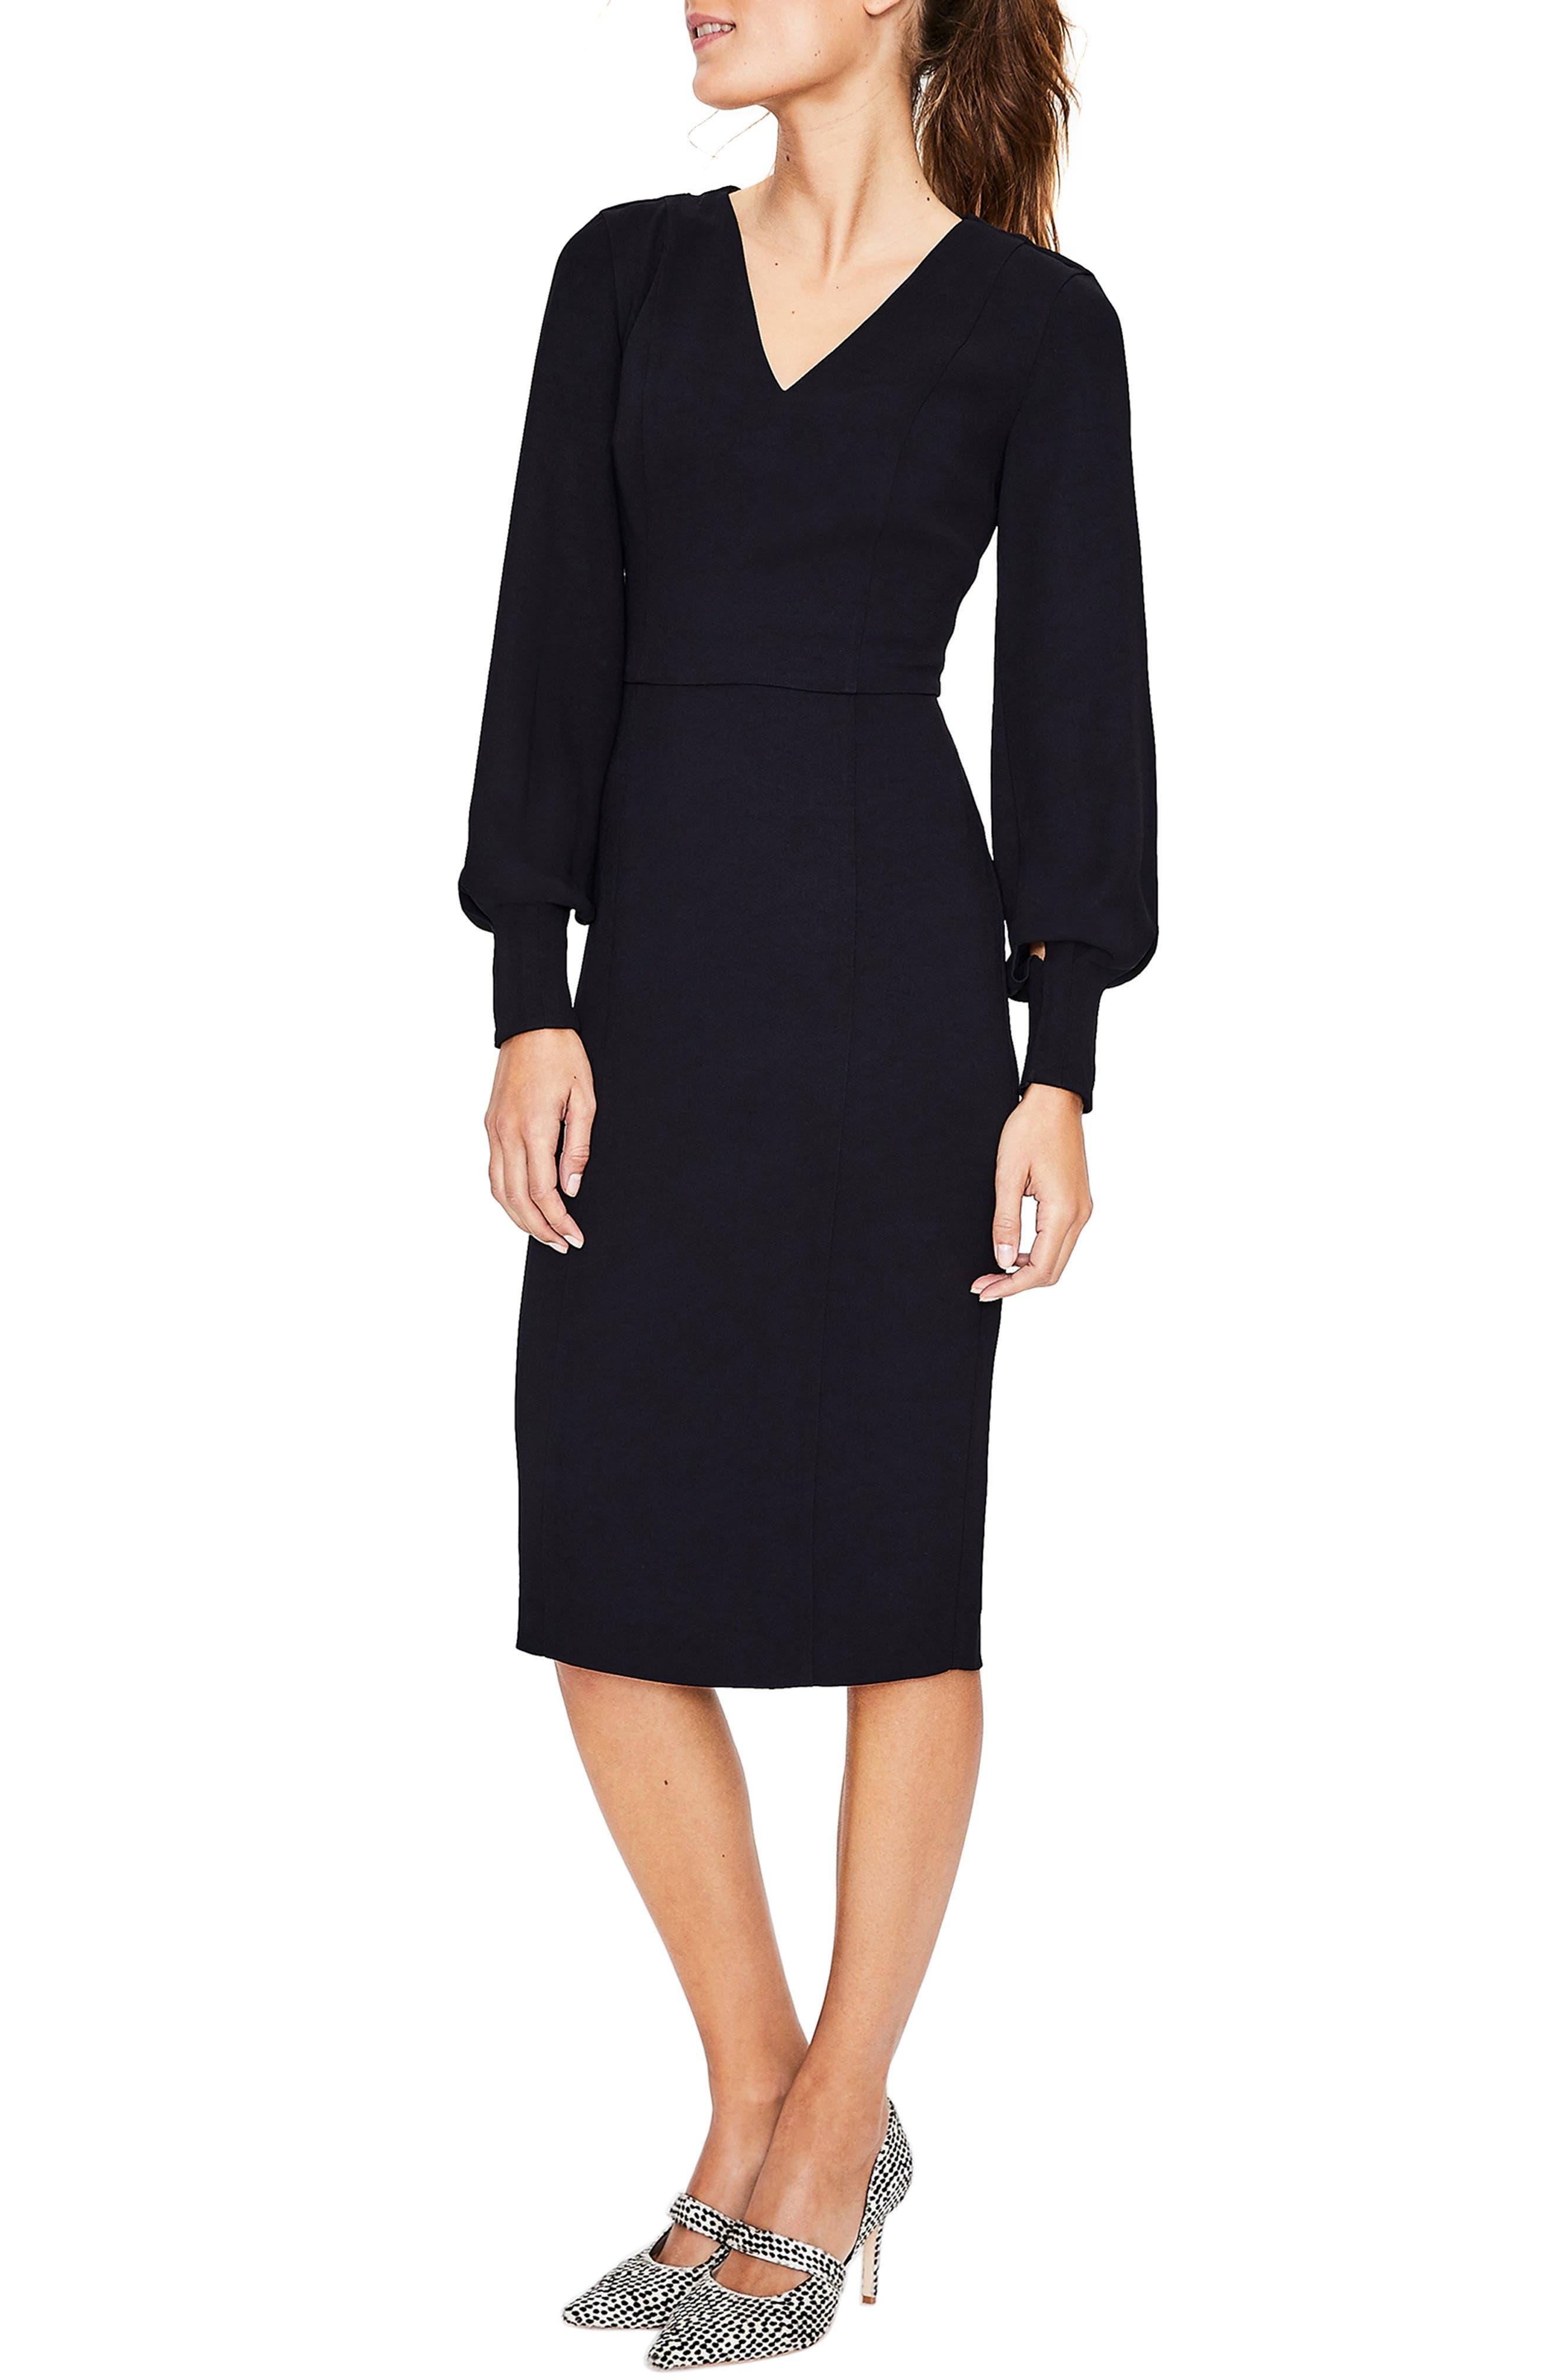 BODEN Hannah Sheath Dress, Main, color, 014